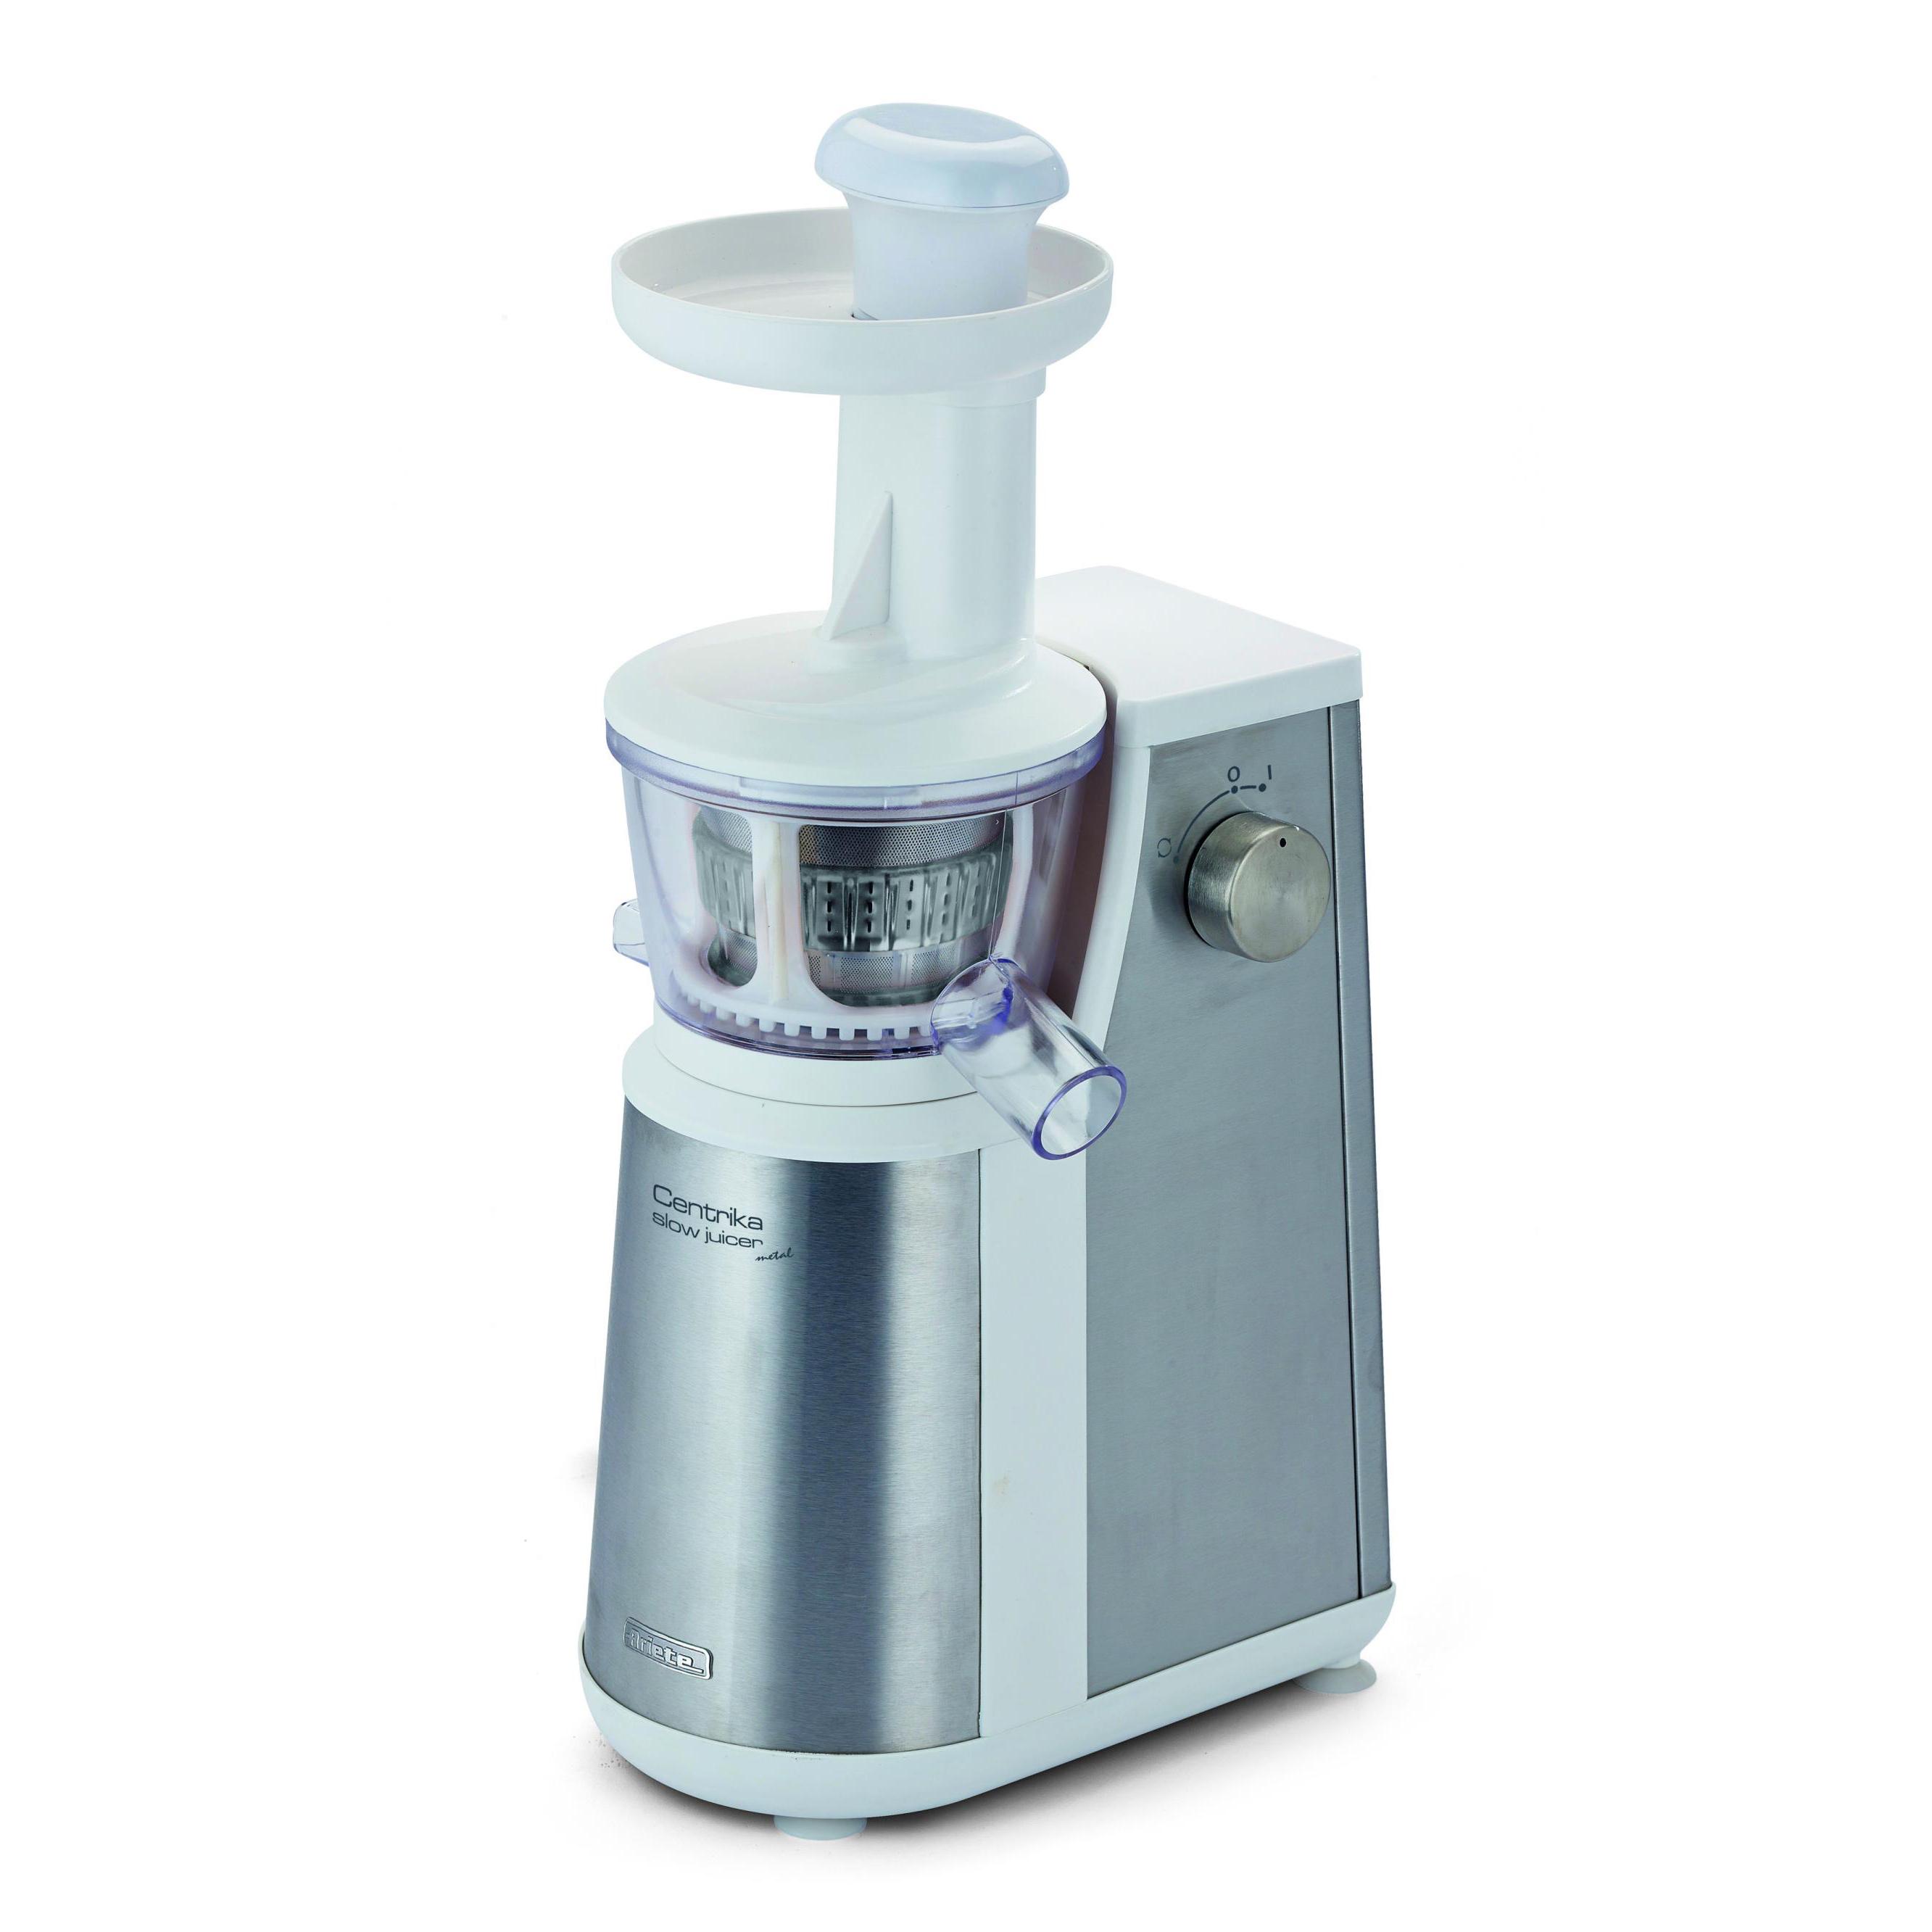 Slow Juicer Panasonic Opinioni : Recensione Ariete 00C017700AR0 Centrika Slow Juicer Metal Opinioni Estrattori di Succo ...